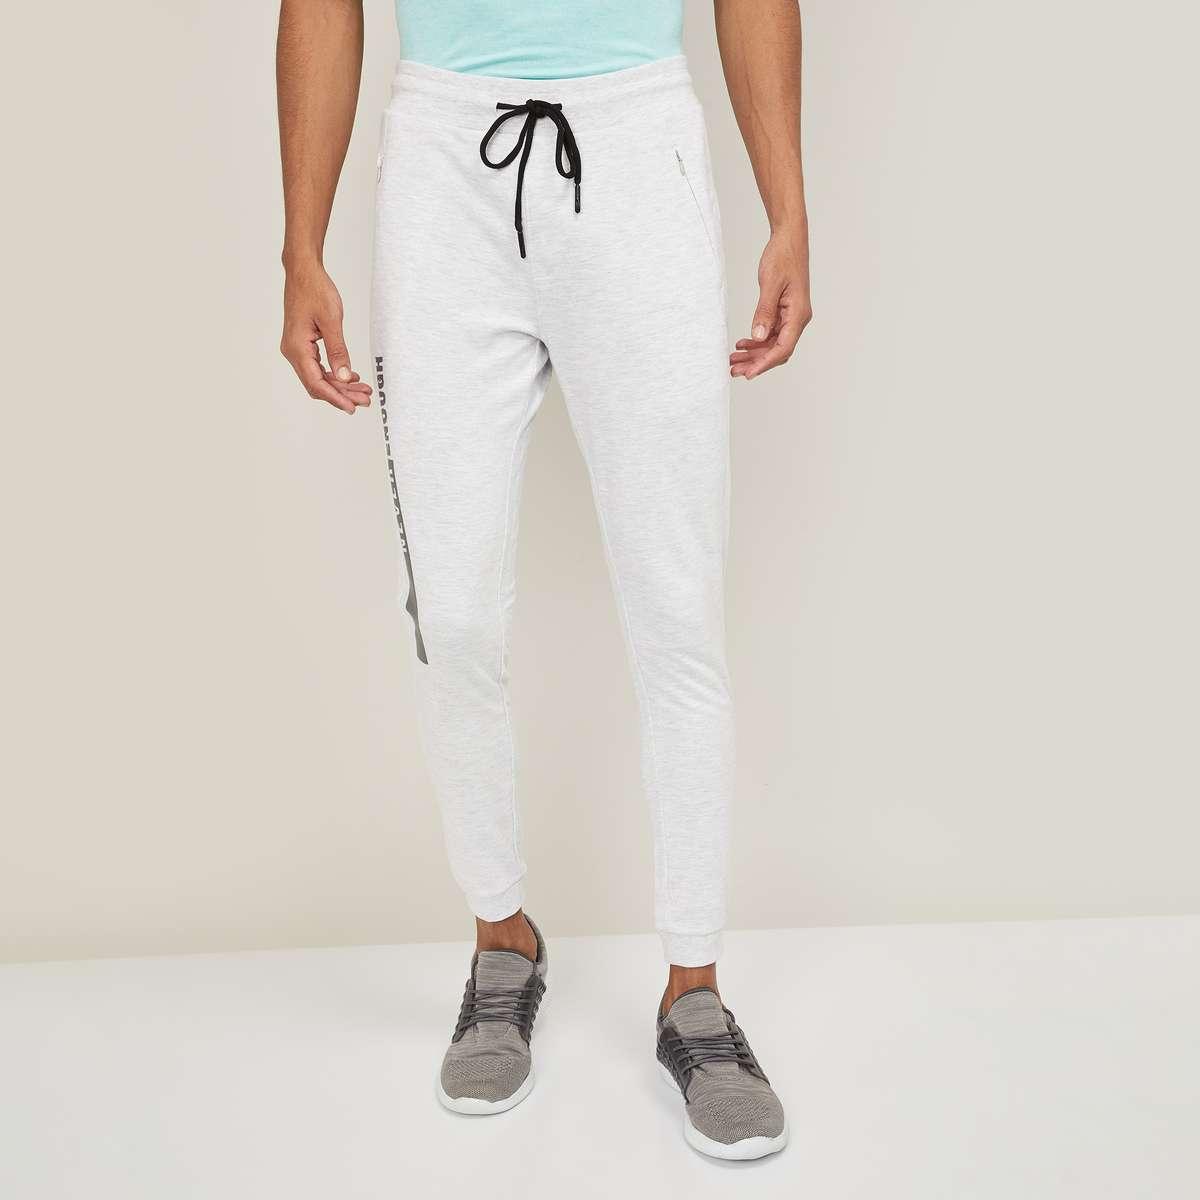 4.KAPPA Men Printed Elasticated Track Pants